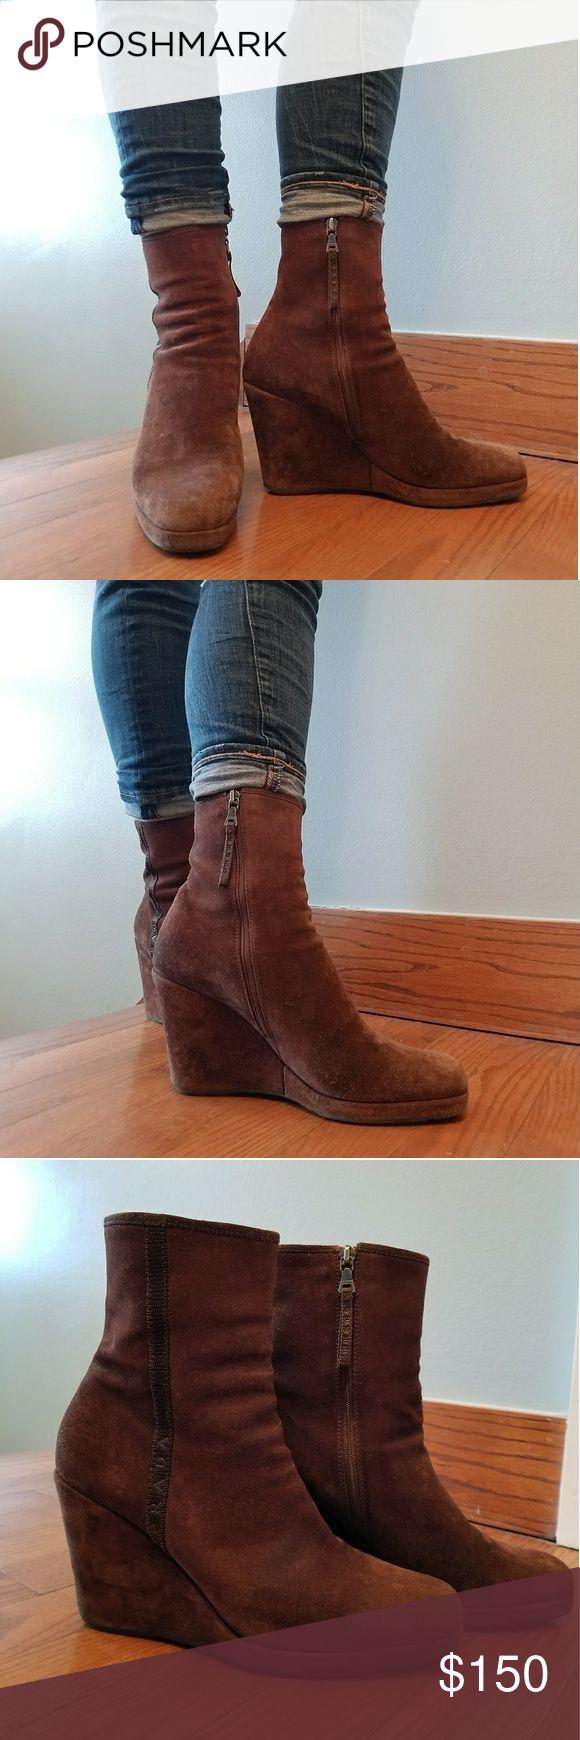 Prada Suede Brown Wedge Boots Prada Suede Brown Wedge Boots, Zippered Side Closure, EUC. Prada Shoes Wedges